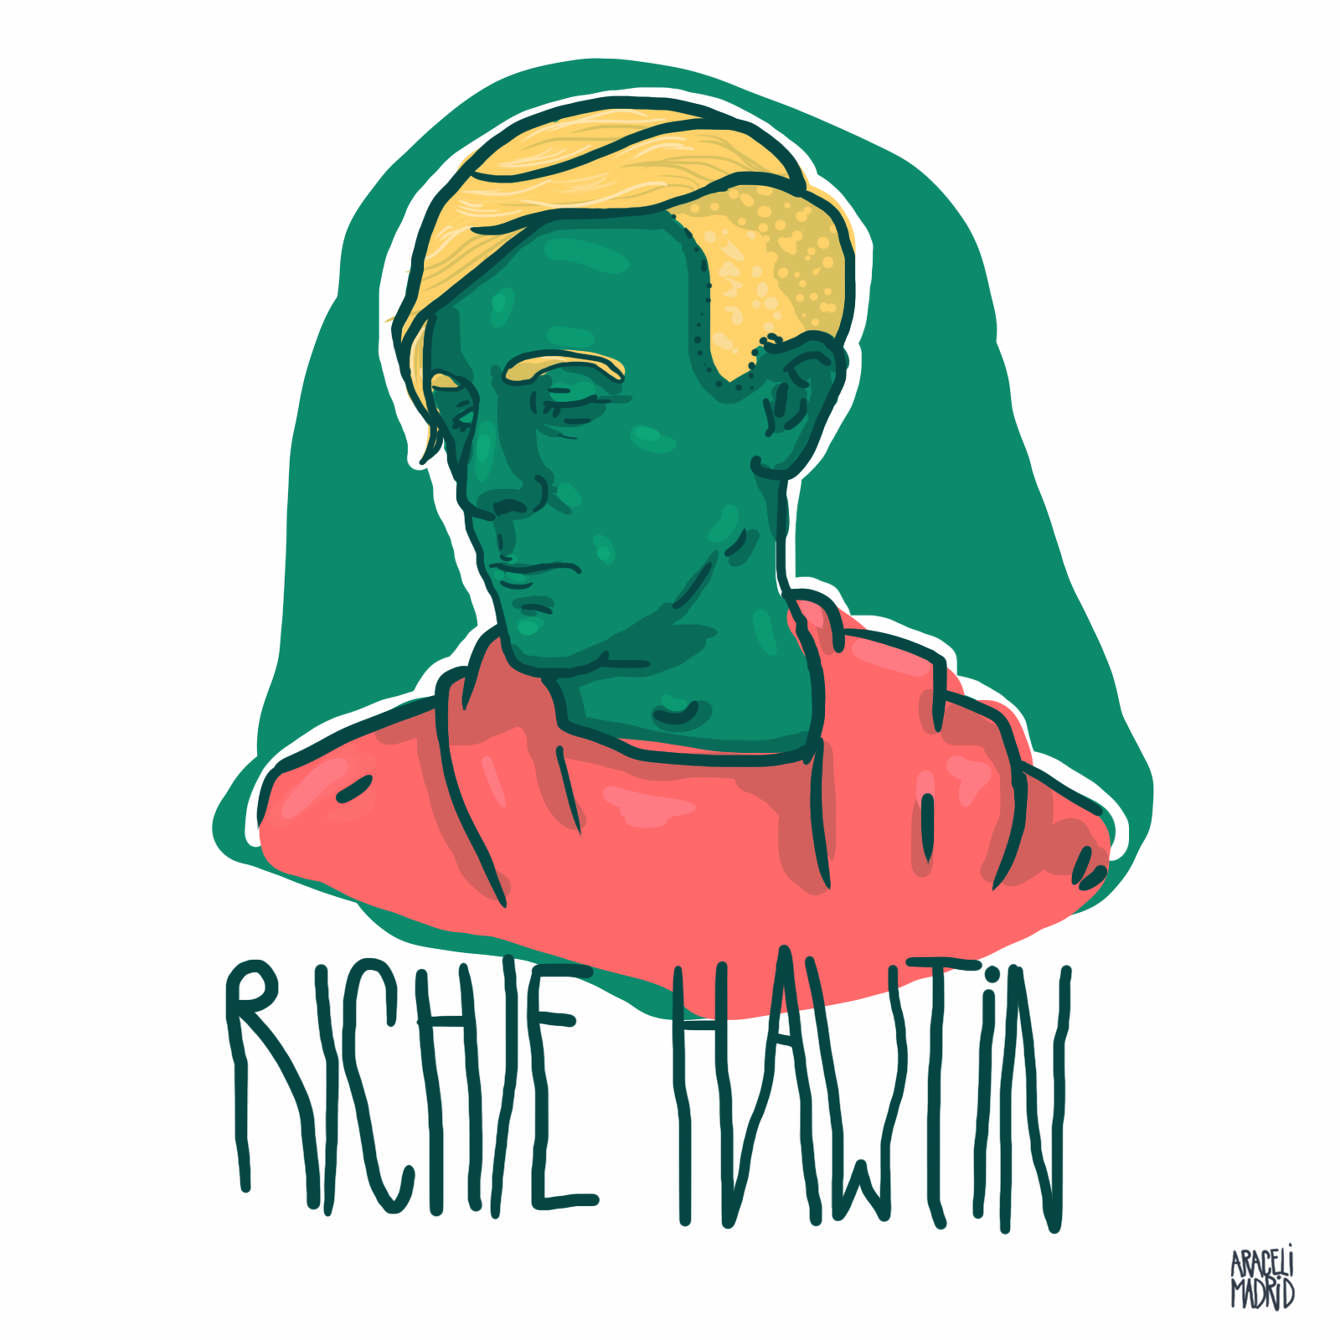 Richie Hawtin Djs ilustrados